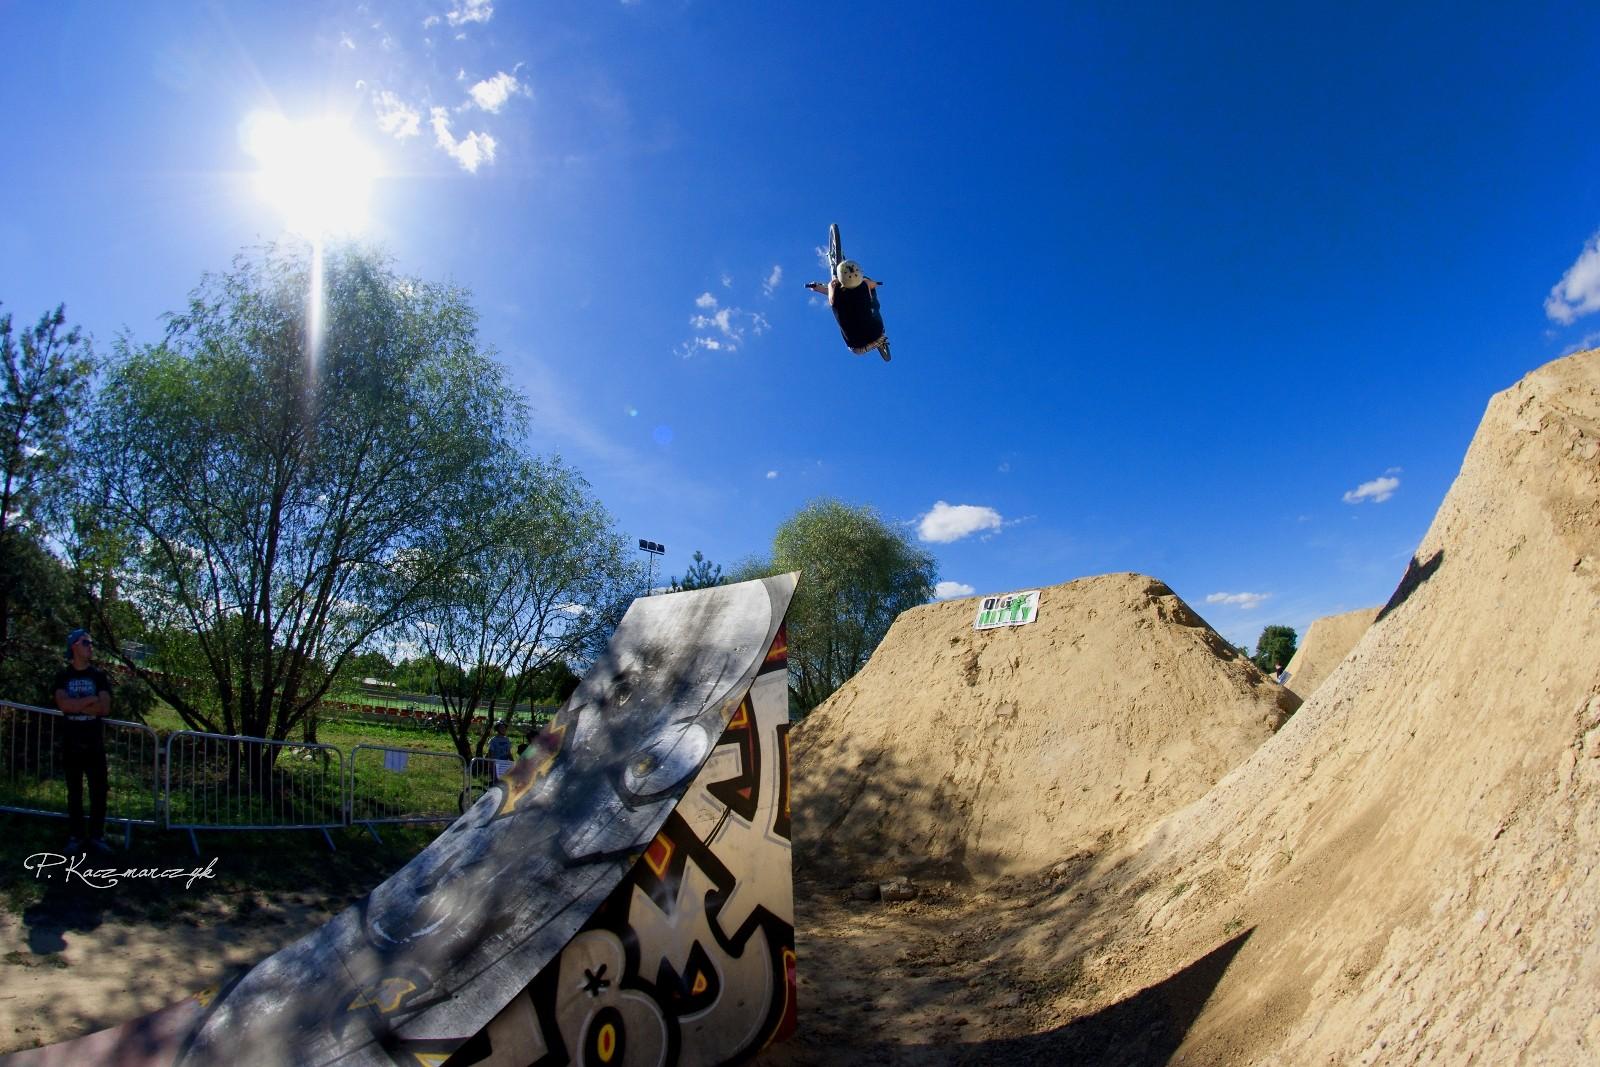 Backflip X-Up - piotrkaczmarczyk - Mountain Biking Pictures - Vital MTB